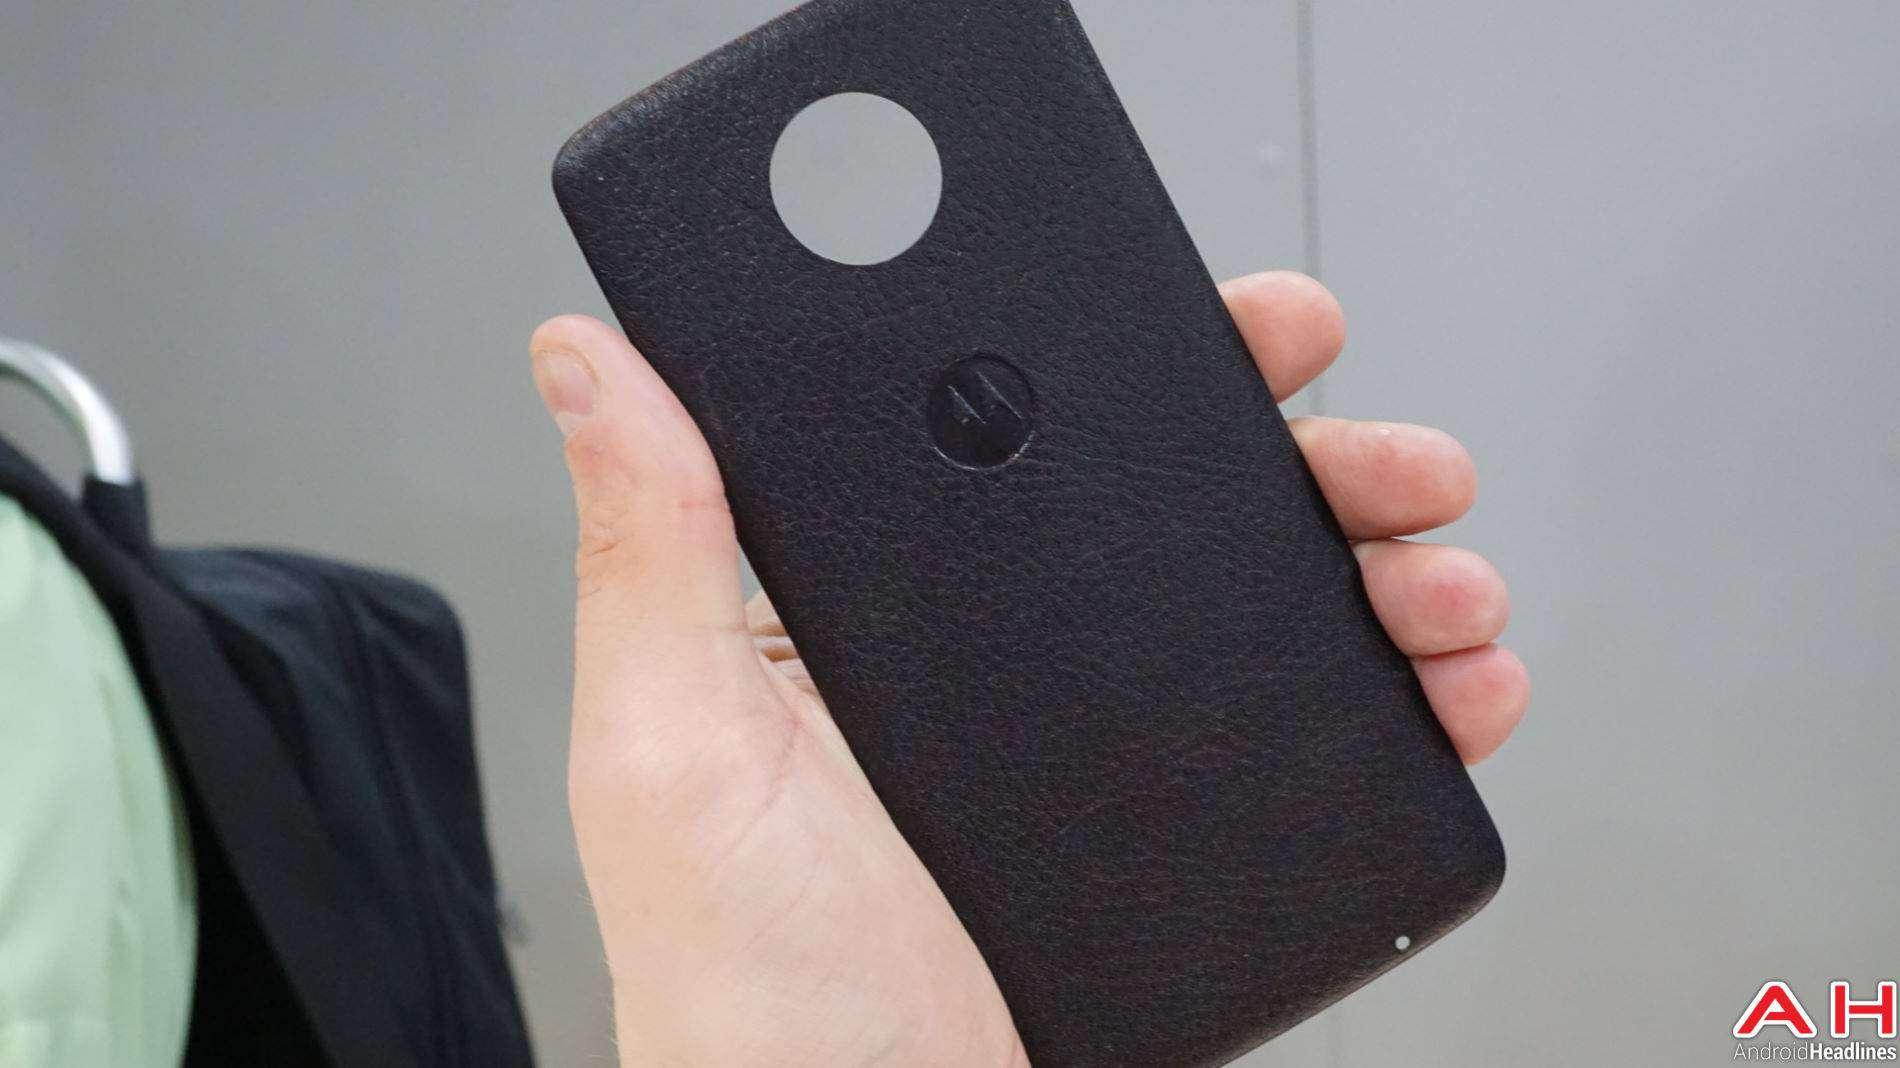 Moto Mods Lenovo Hands On AH 1 1